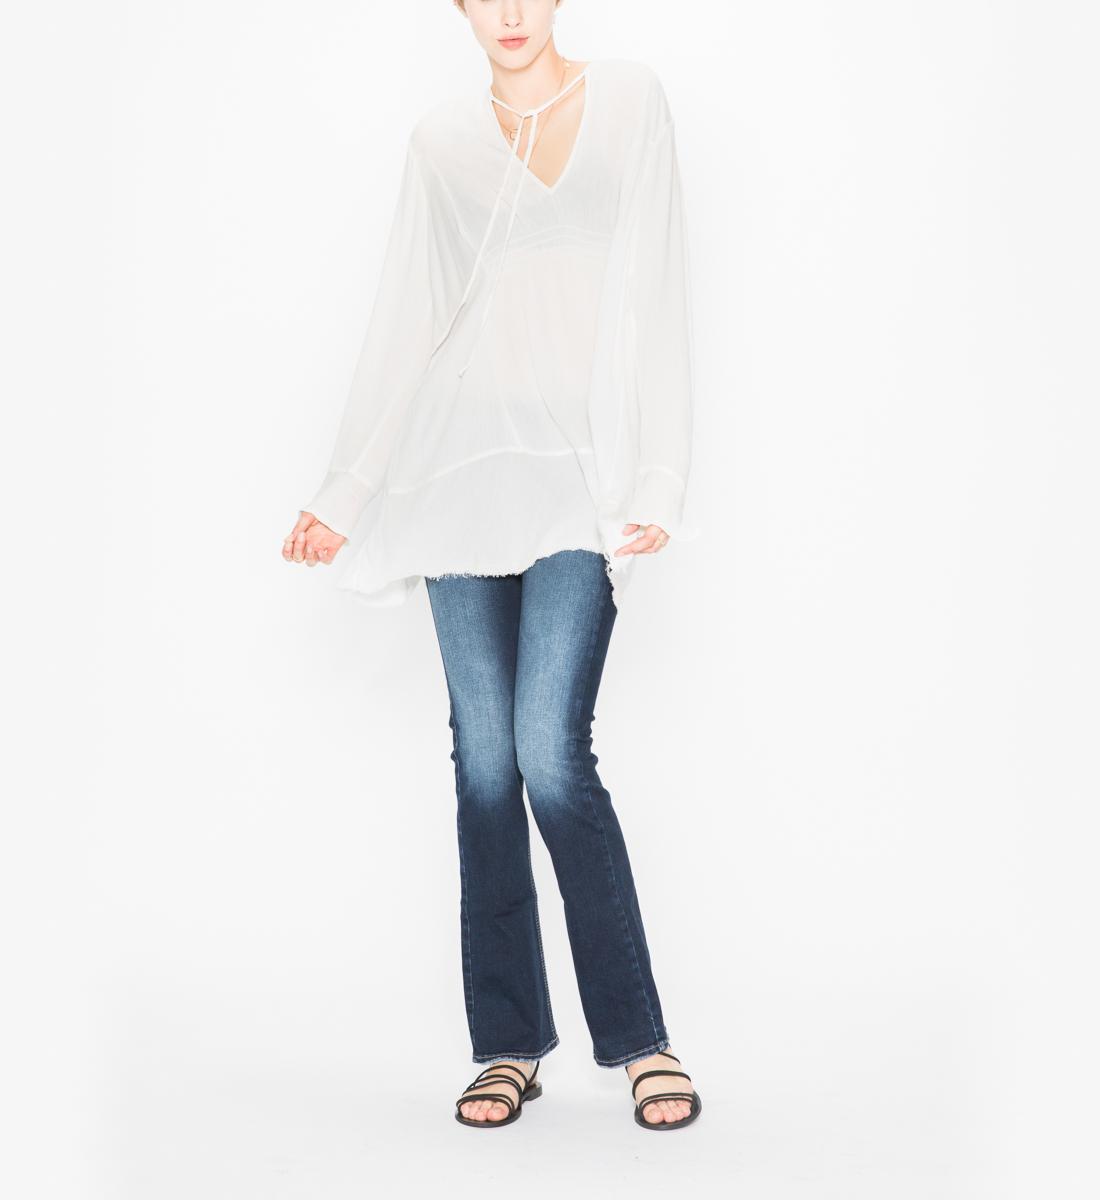 740eae97df6 Sophia - Flowy Tunic Peasant Top - Silver Jeans US